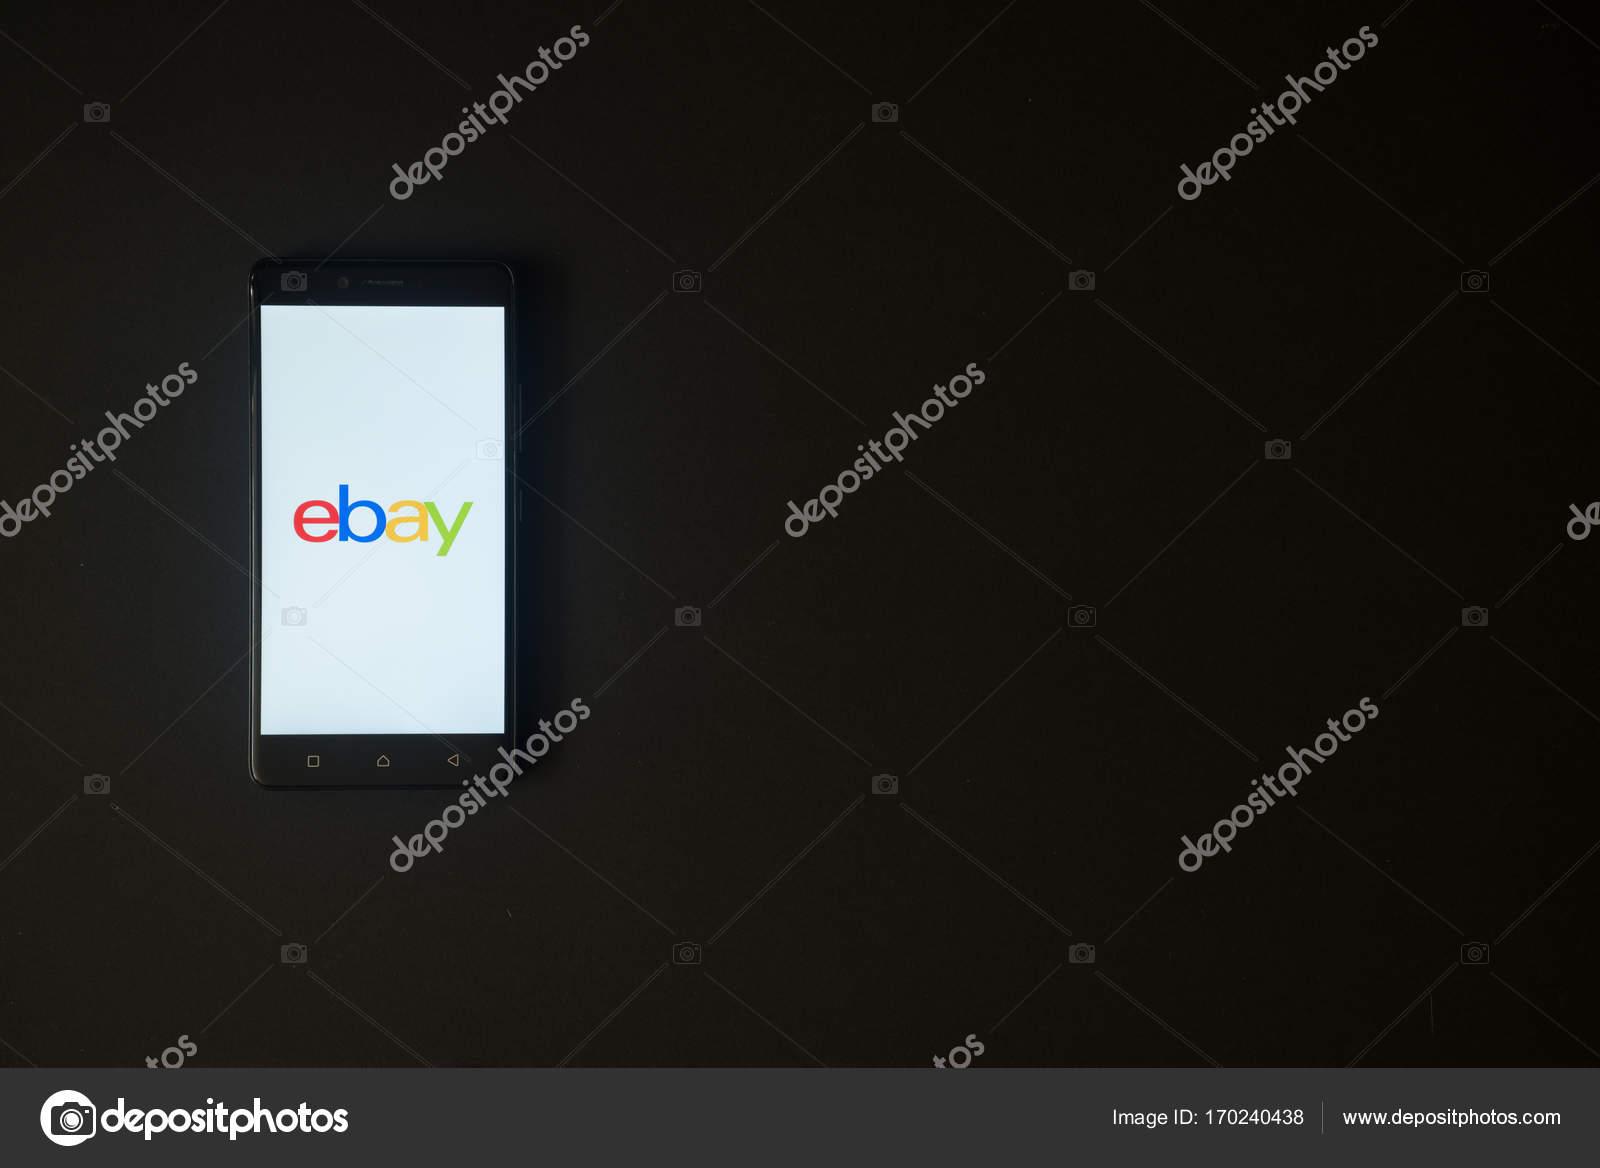 Ebay Logo On Smartphone Screen On Black Background Stock Editorial Photo C Pe3check 170240438